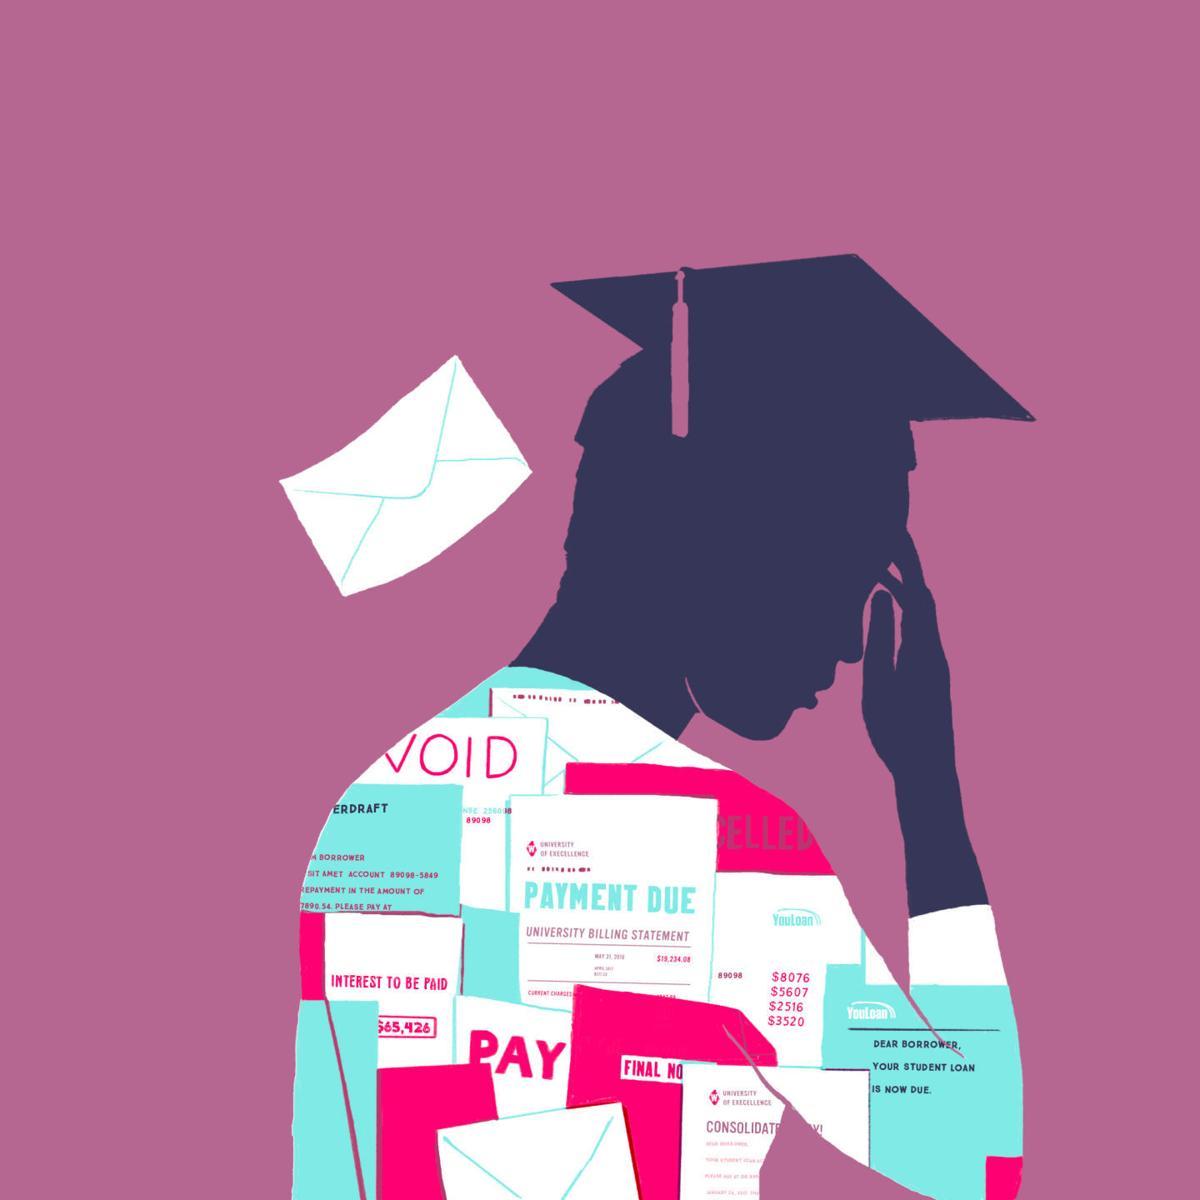 student loan debt illustration (copy)